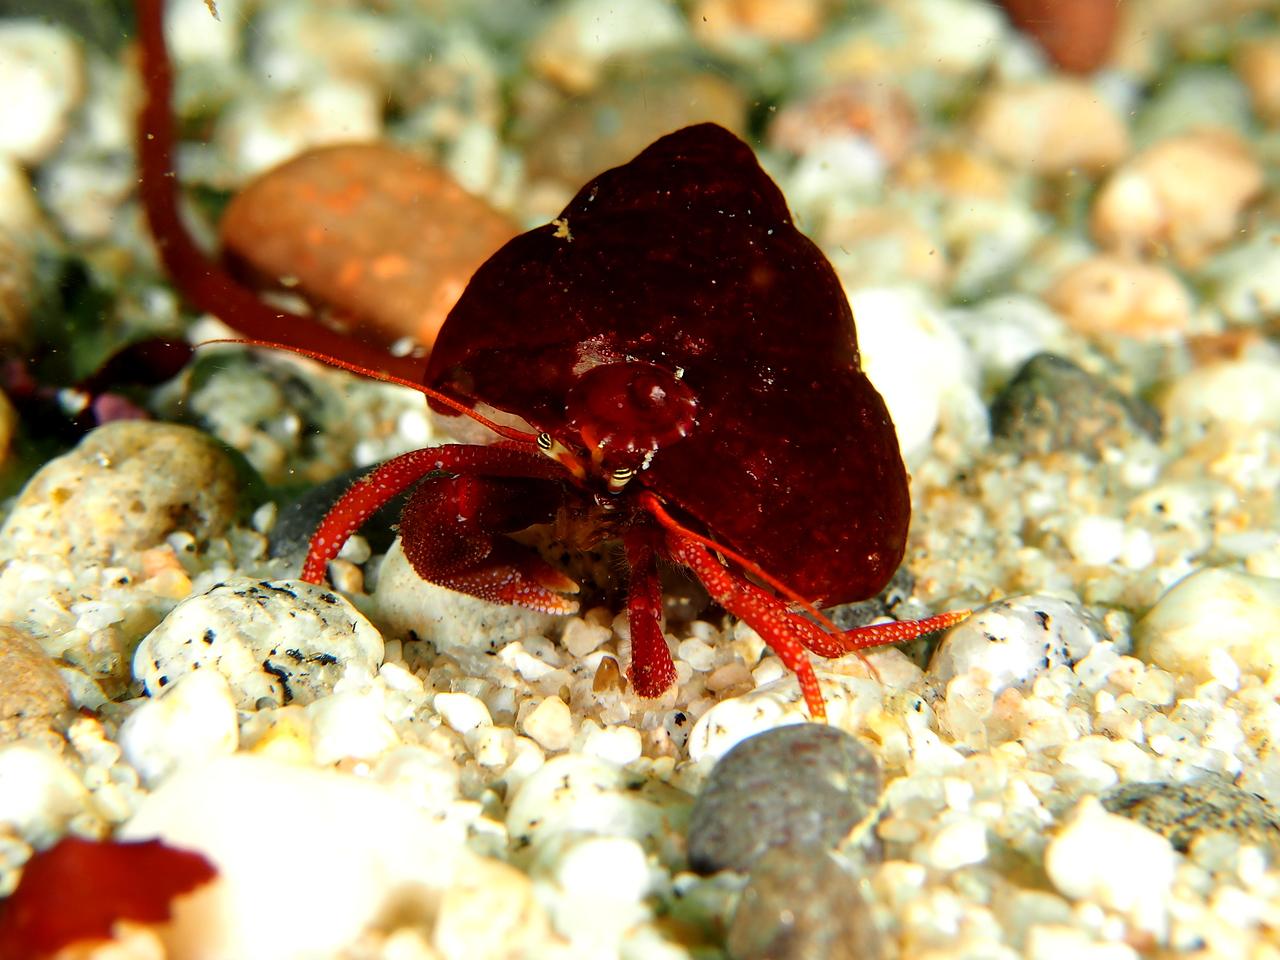 Maroon Hermit Crab